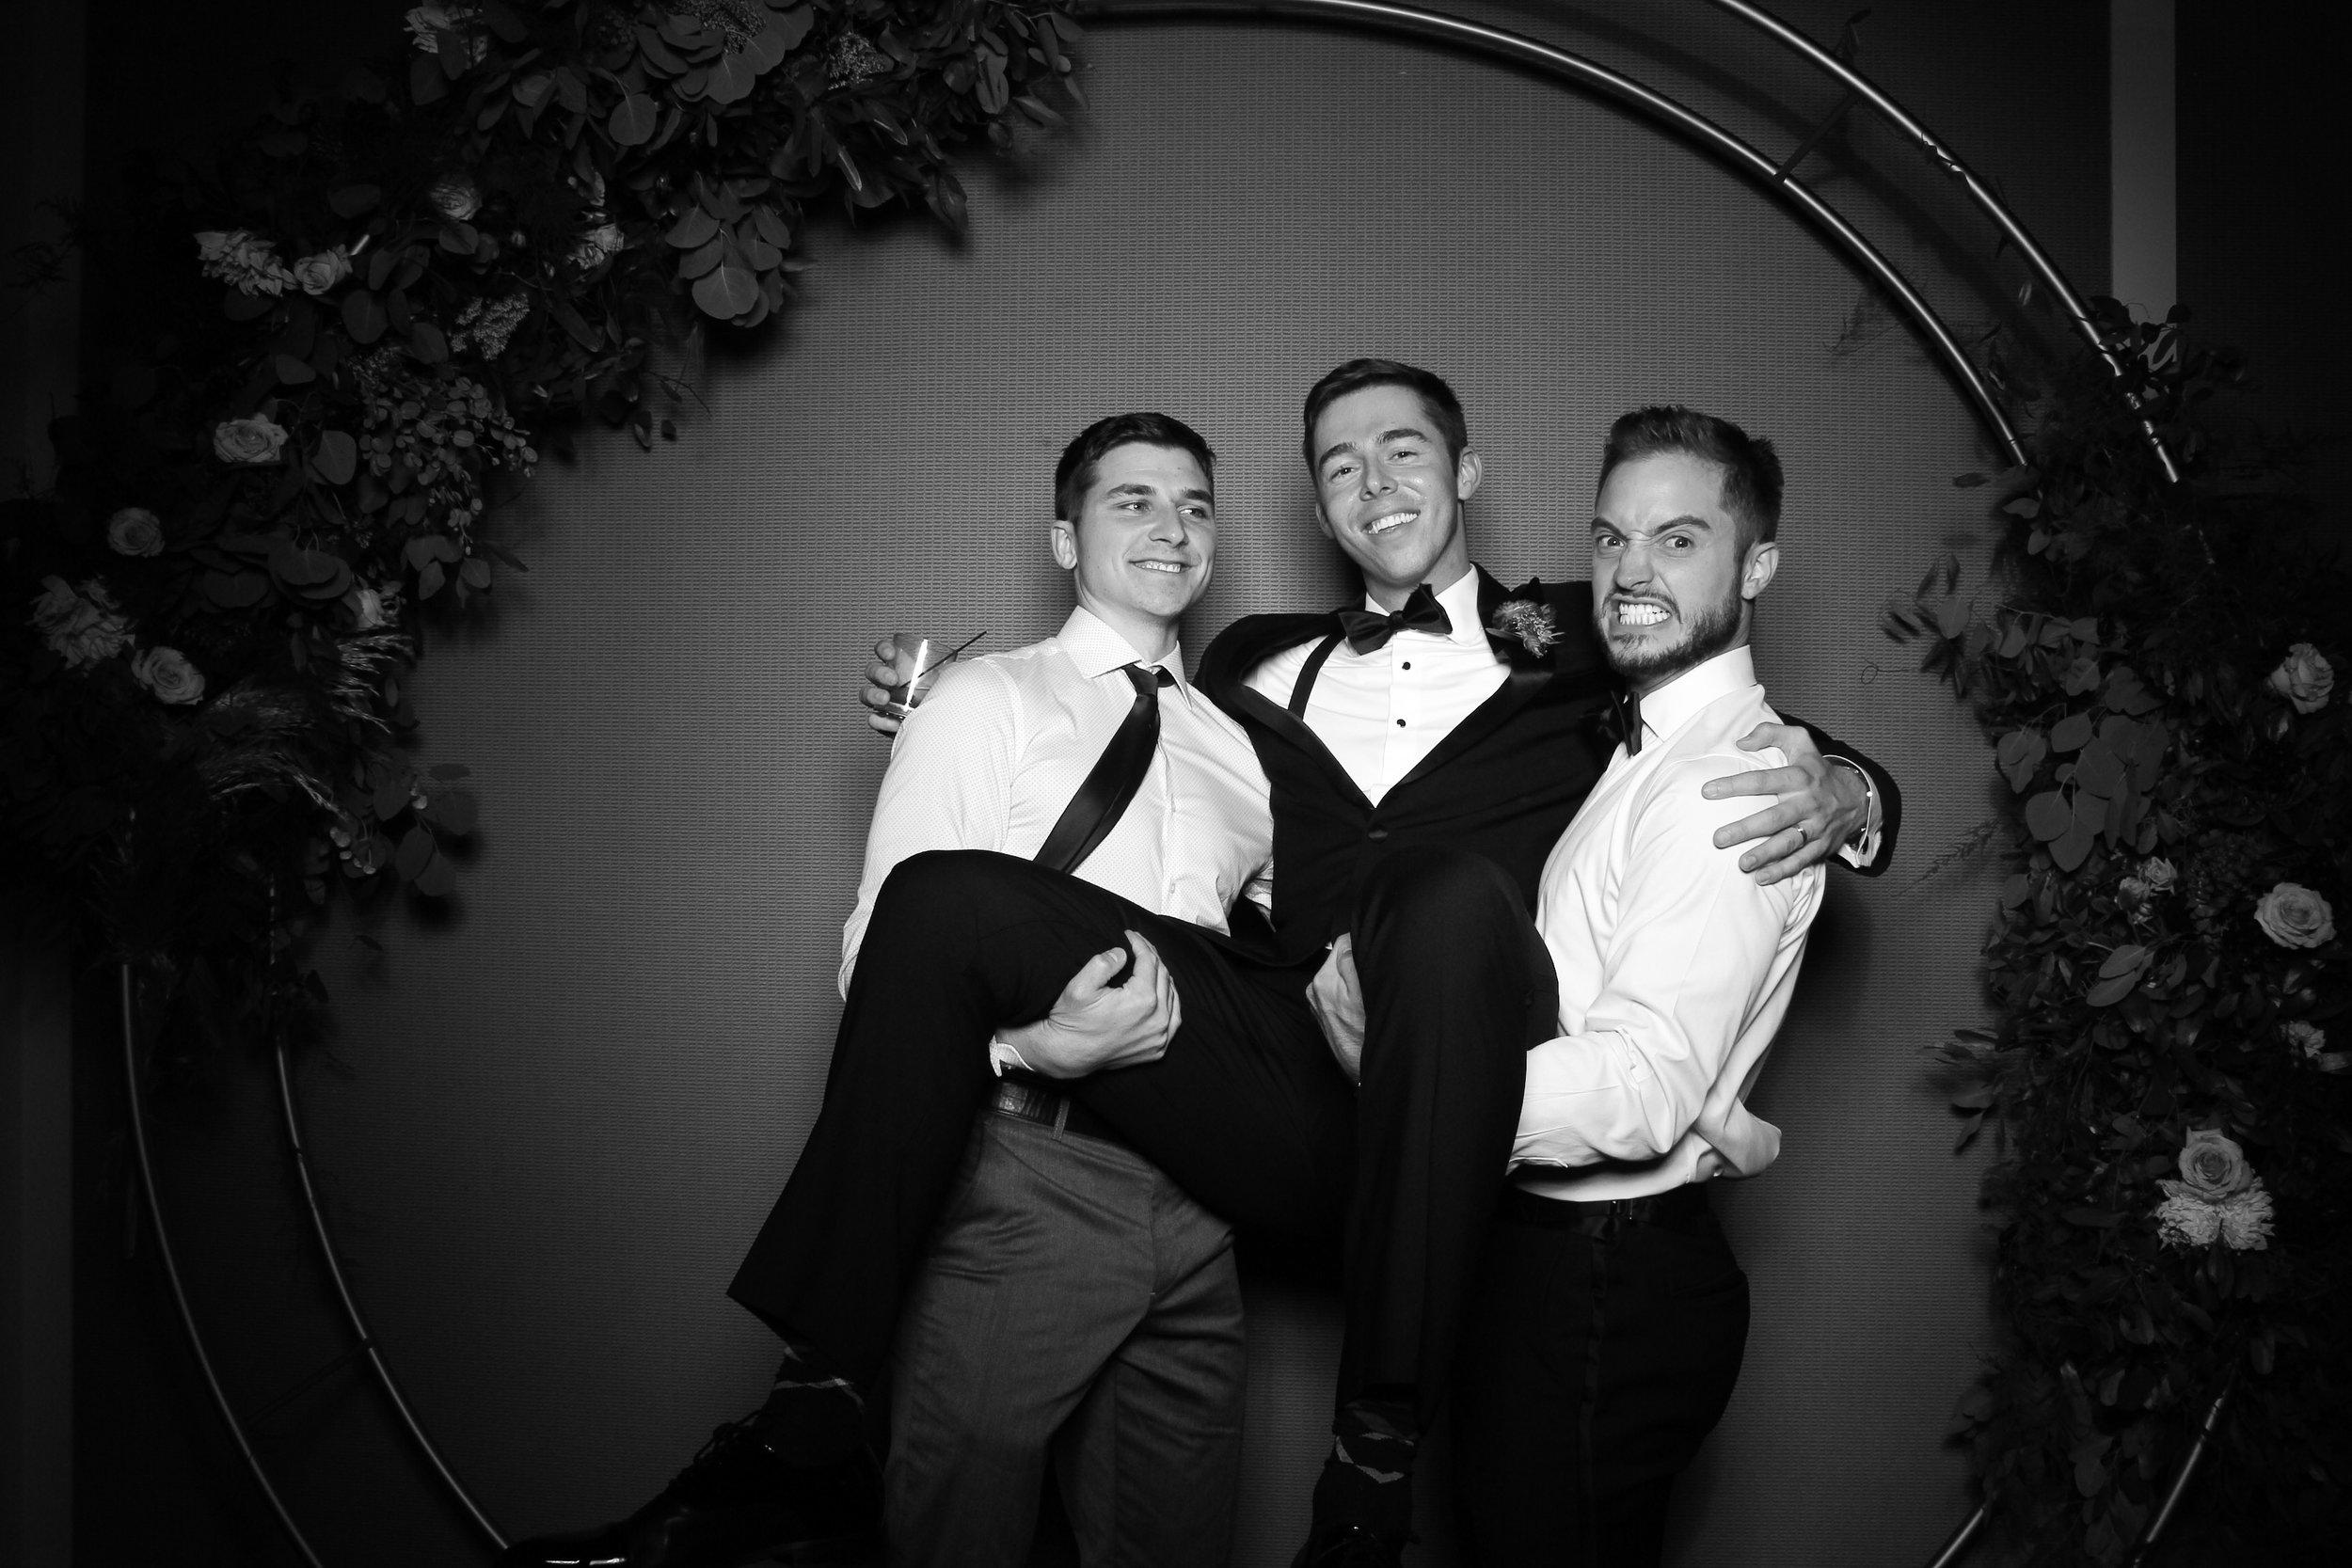 Metropolis_Ballroom_Wedding_Arlington_Heights_Photo_Booth_24.jpg